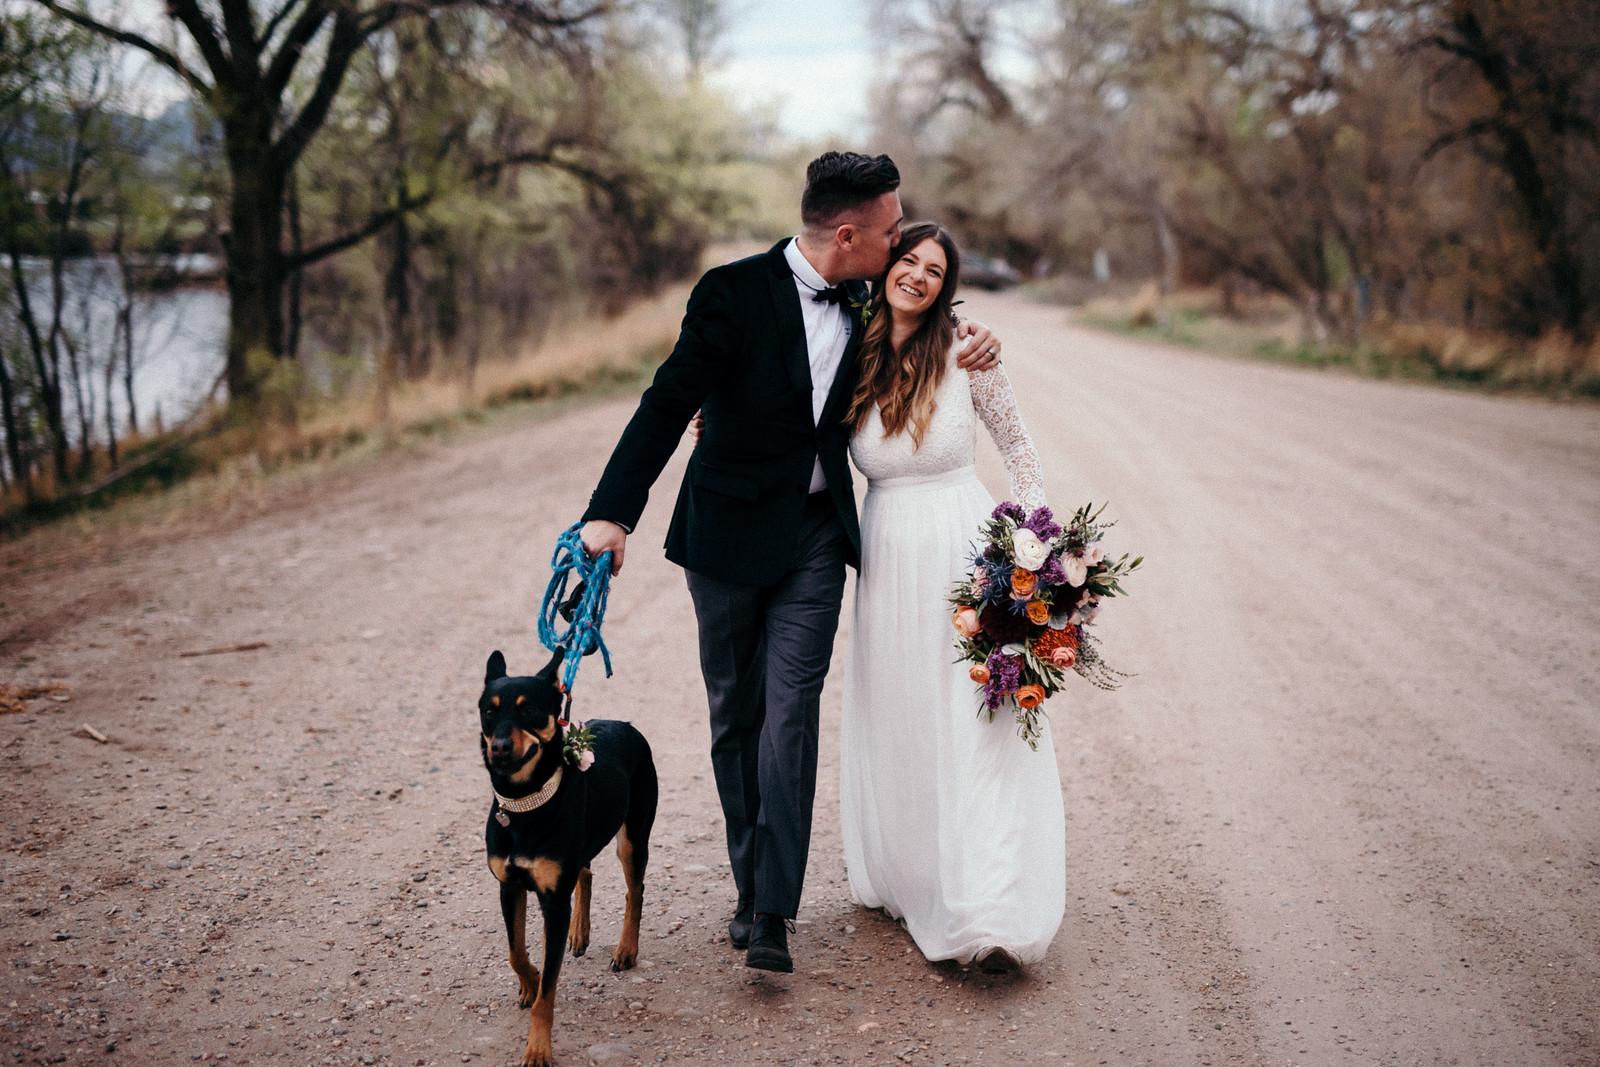 Flowers by Lace and Lilies, elopement, elopement flowers, bridal bouquet, flower crown, boutonniere, rocky mountains, colorado elopement,